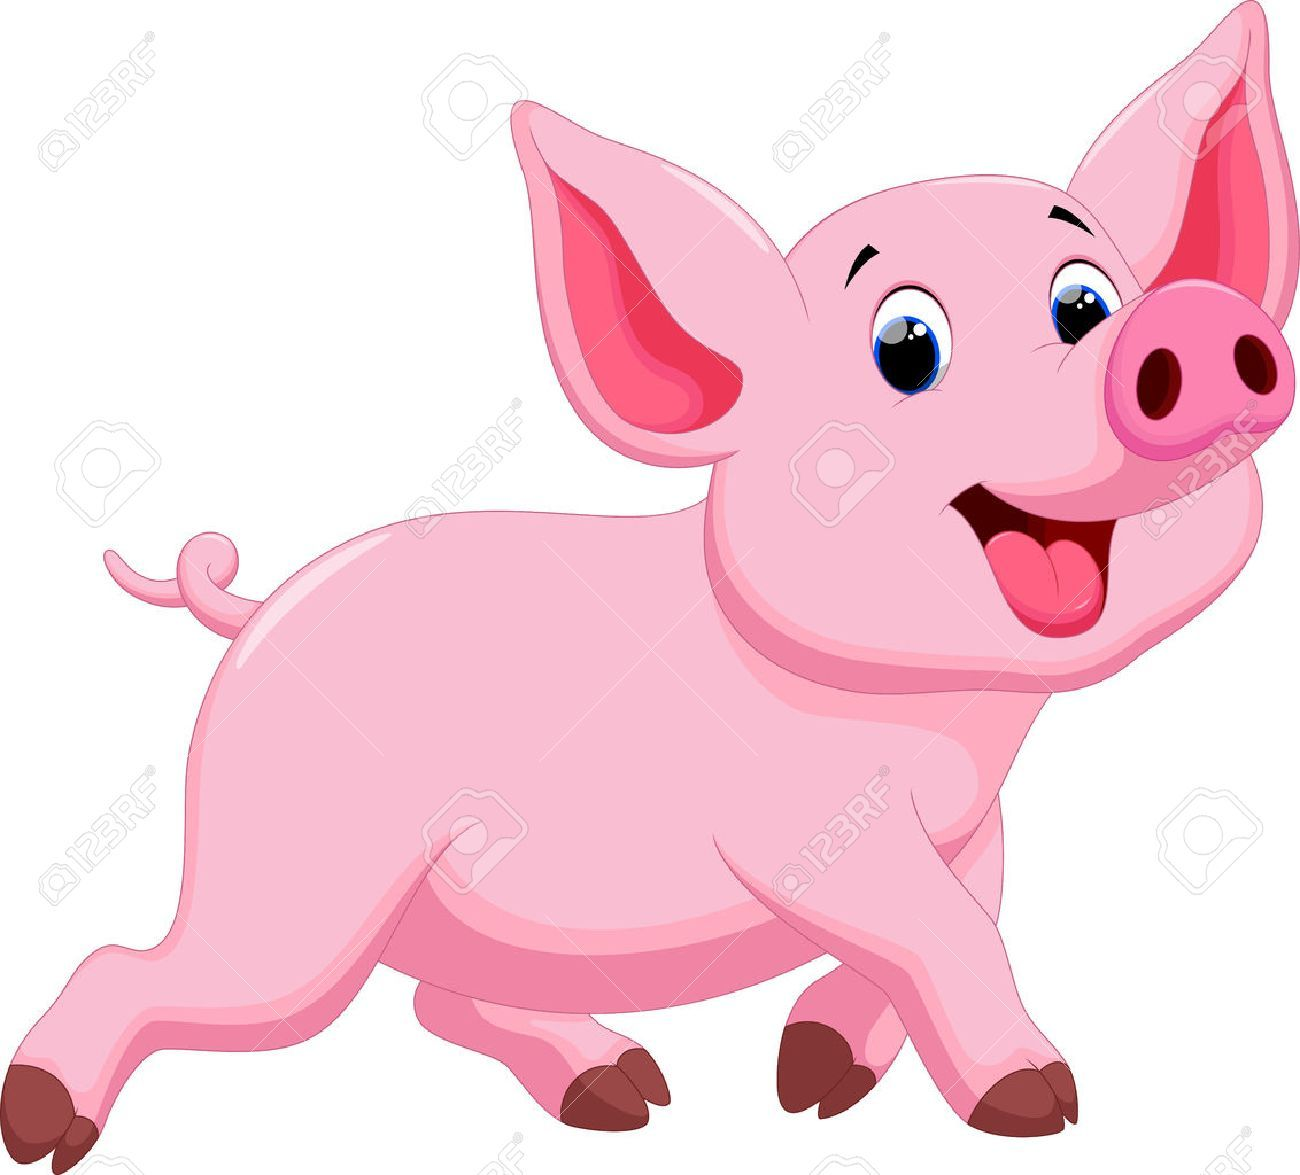 1300x1175 Cartoon Pig Images Images Hd Download